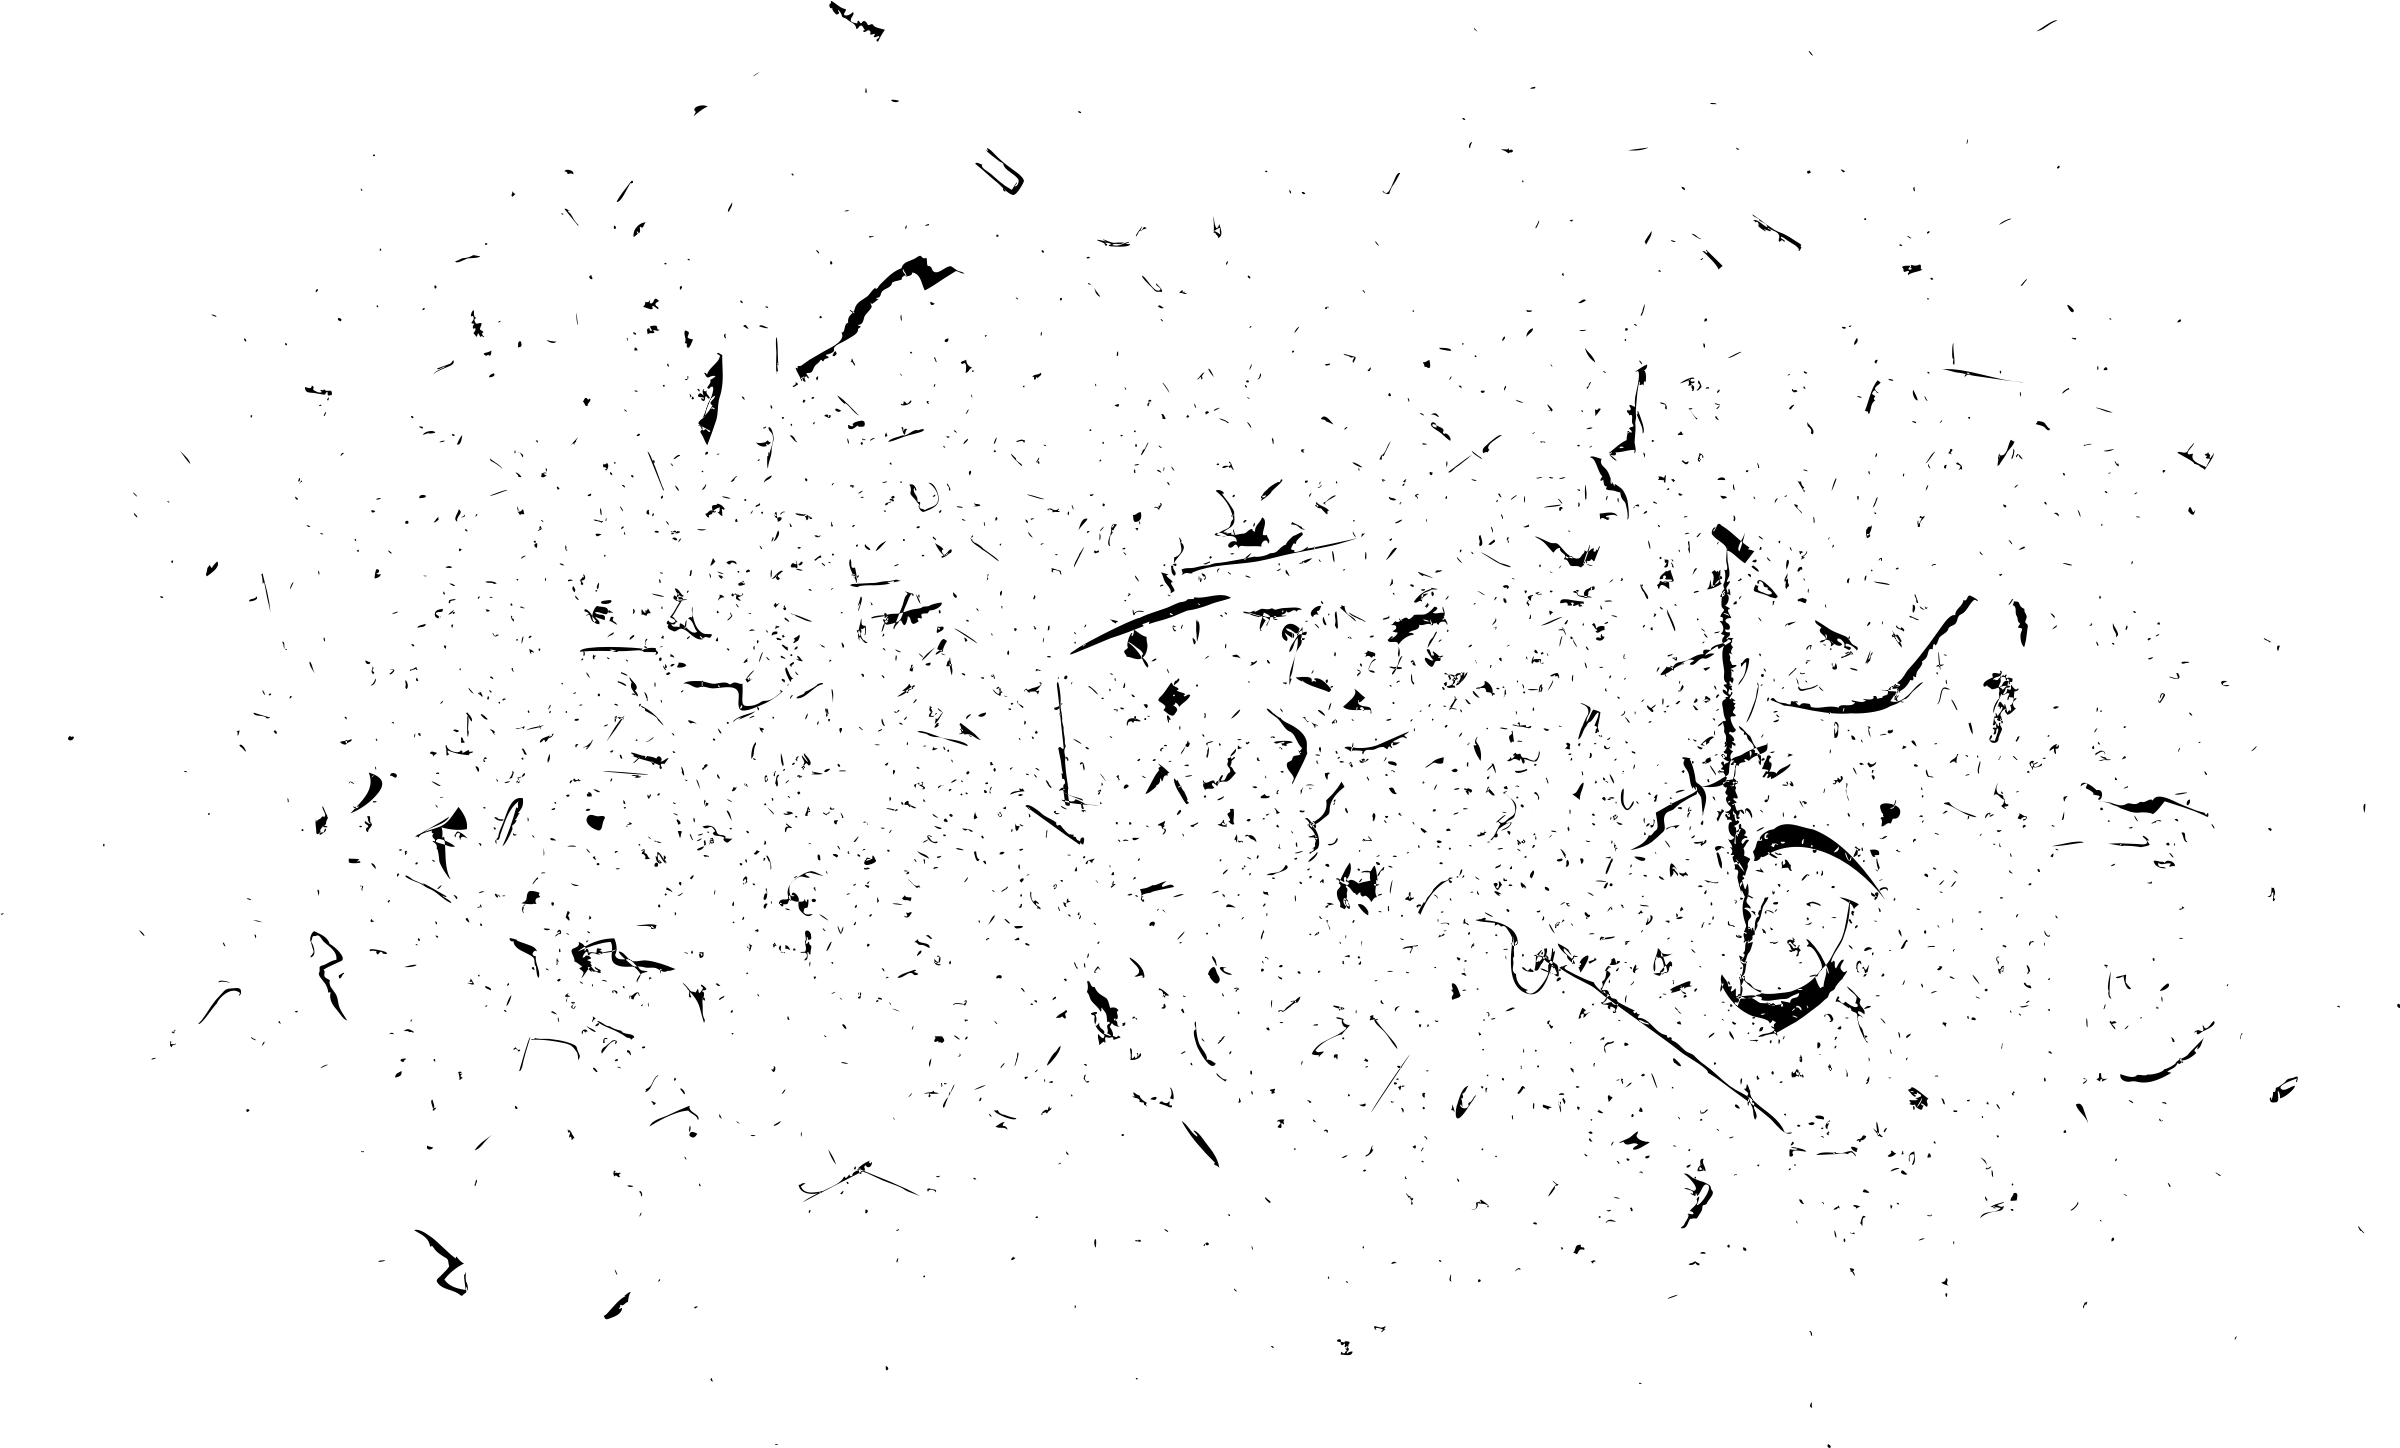 Grunge cross clipart jpg free Grunge Clipart (45+) Desktop Backgrounds jpg free